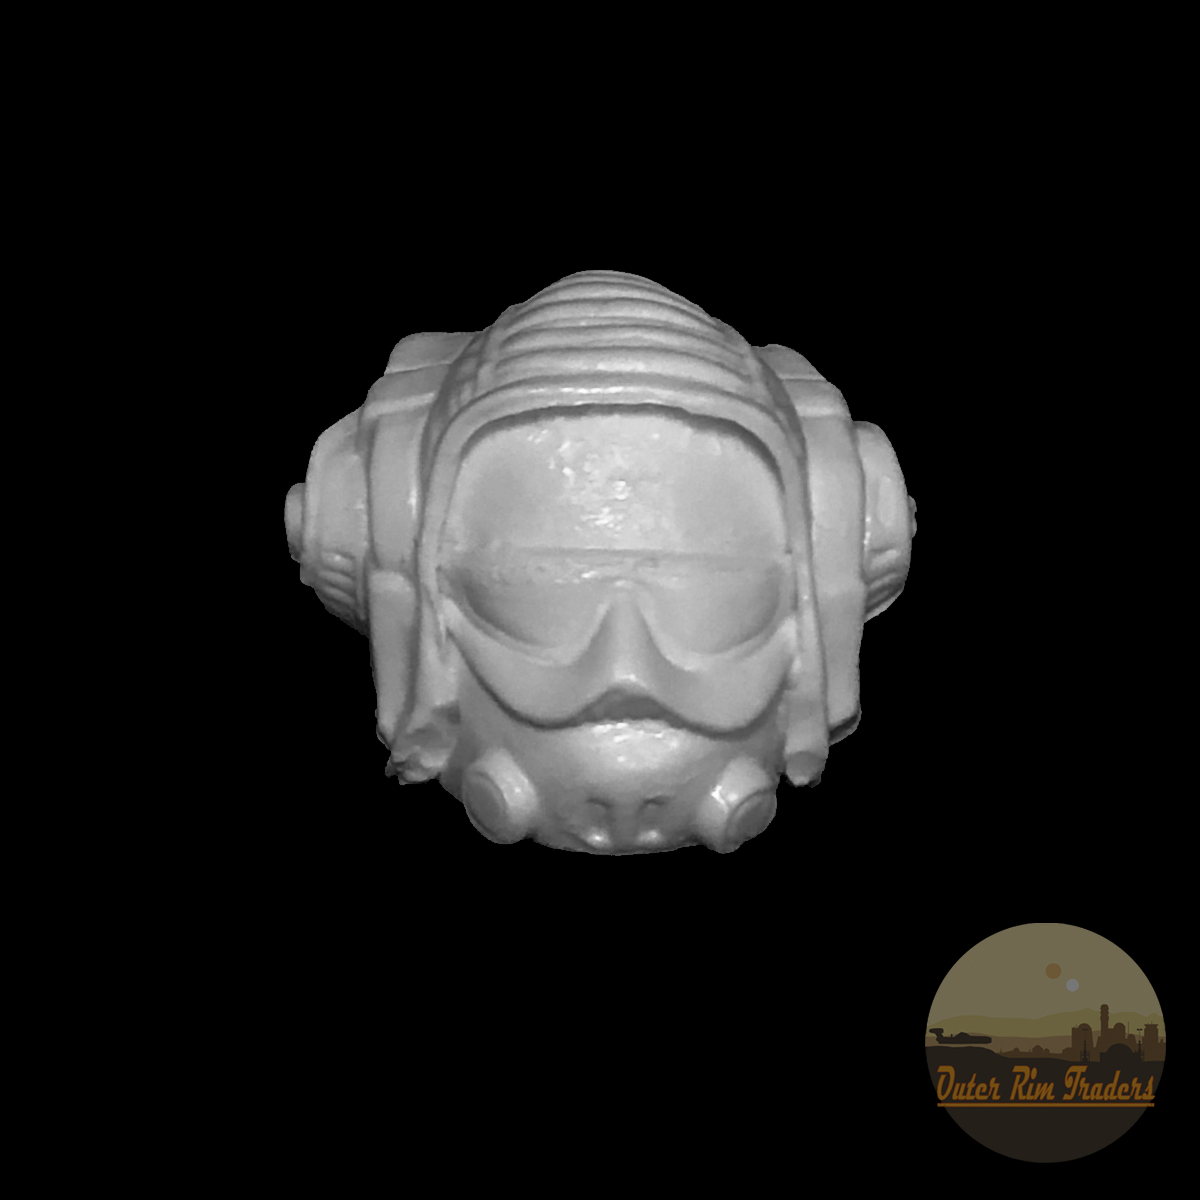 Image of Concept Pilot Helmet